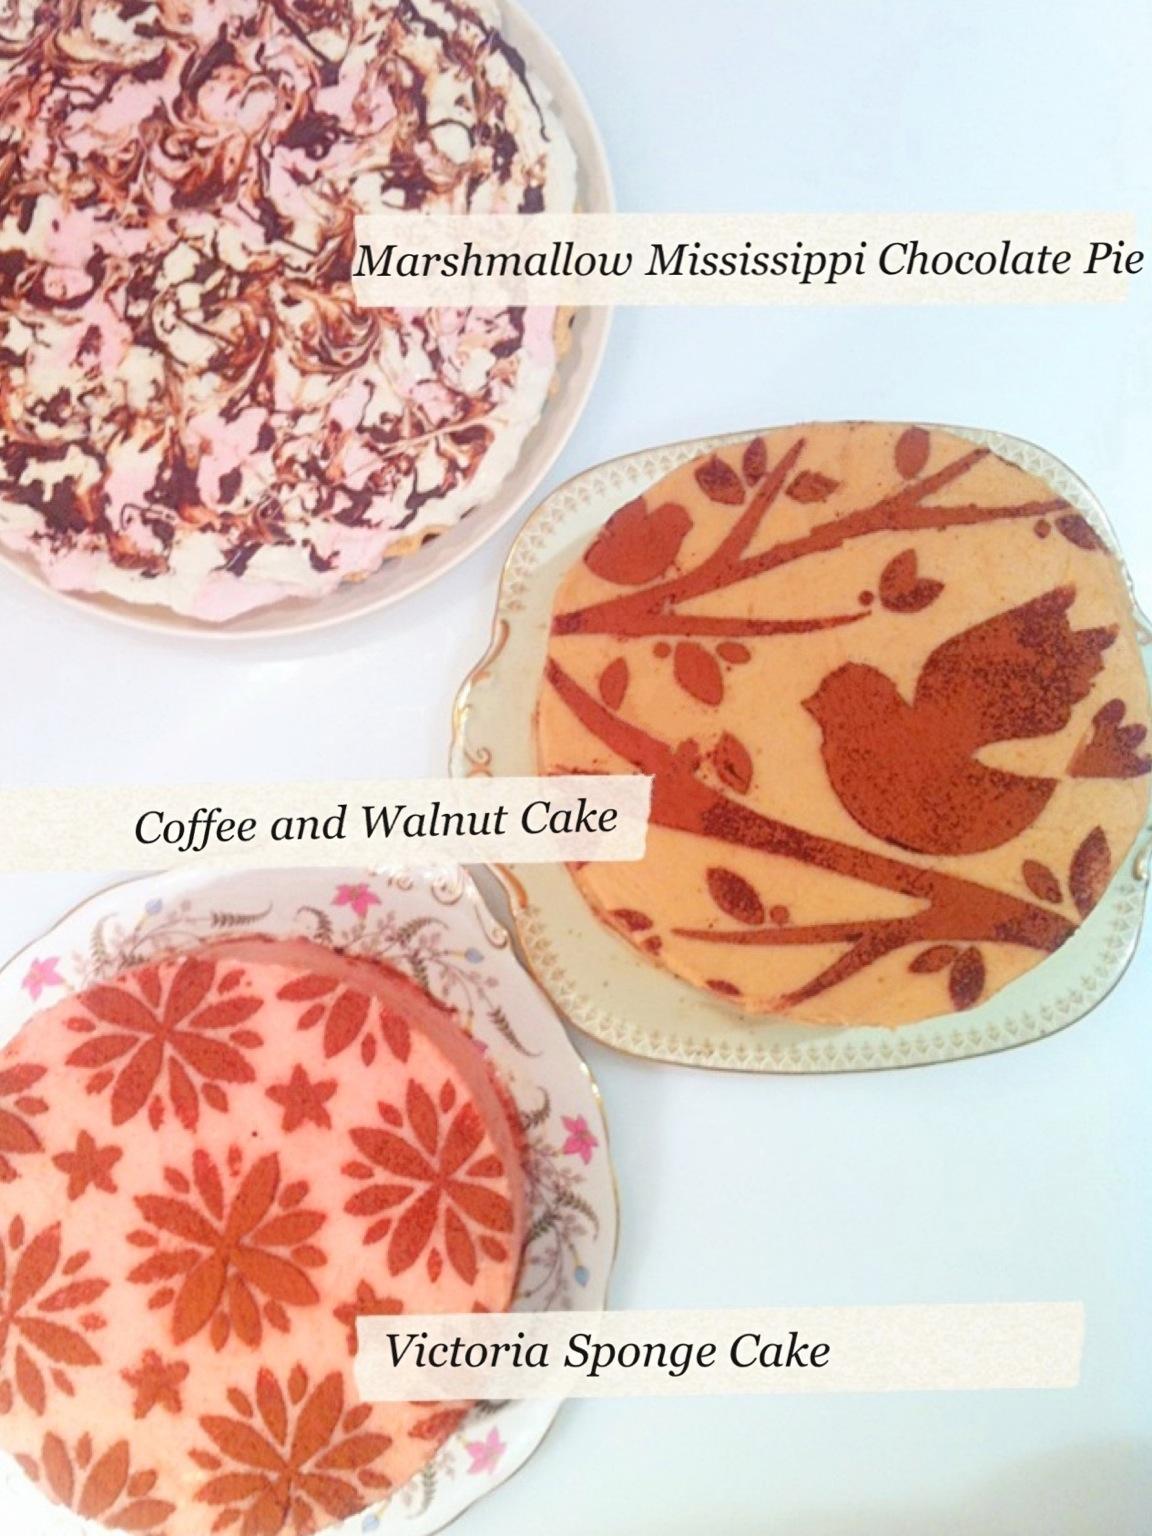 Marshmallow Mississippi Chocolate Pie, Coffee Walnut Cake and Victoria Sponge Birthday Cake London Cherie Kelly